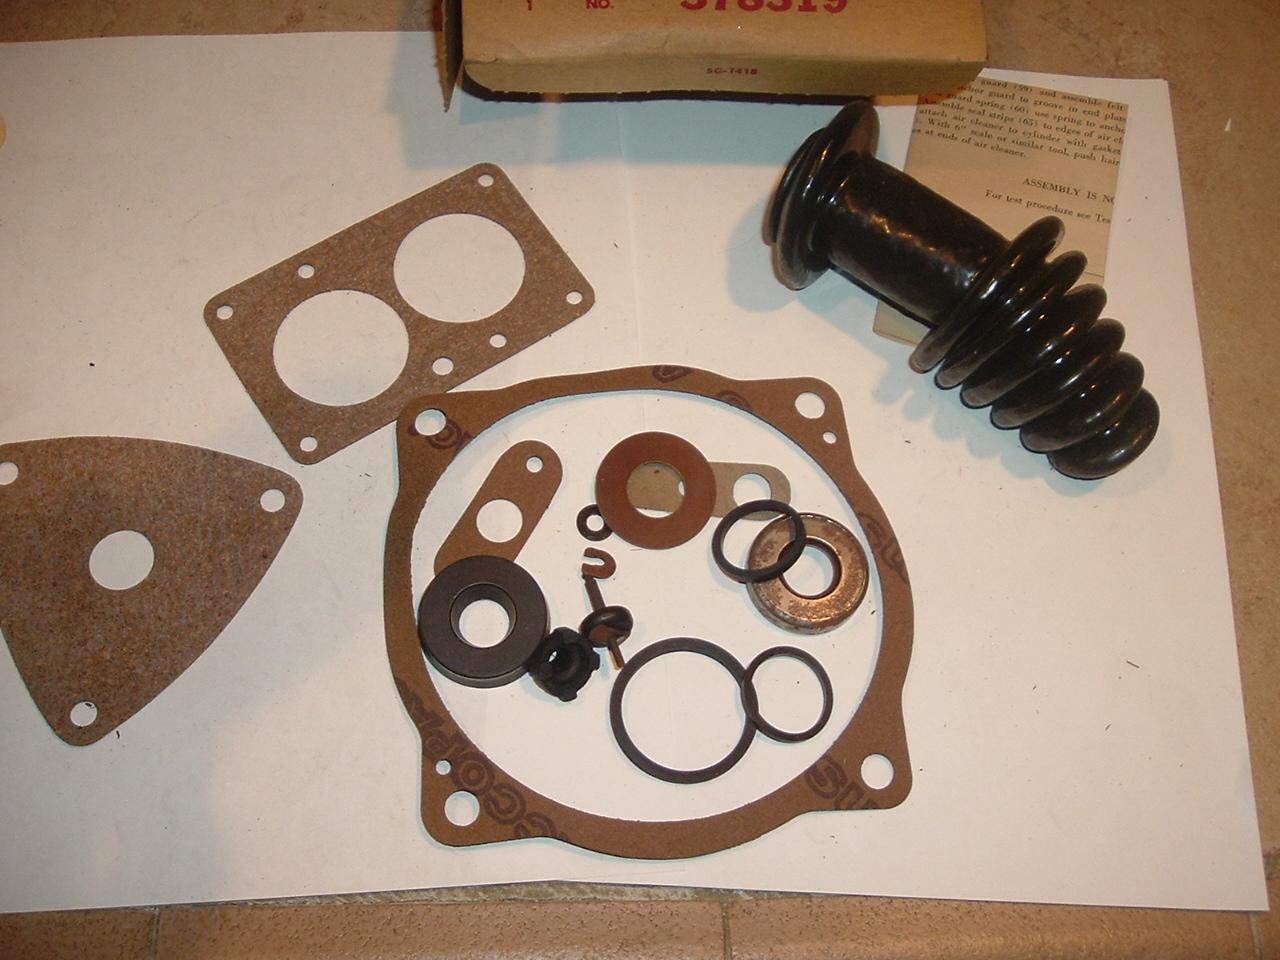 194 Chevrolet 7 Hudson Bendix power brake major rebuild kit (a 378319)